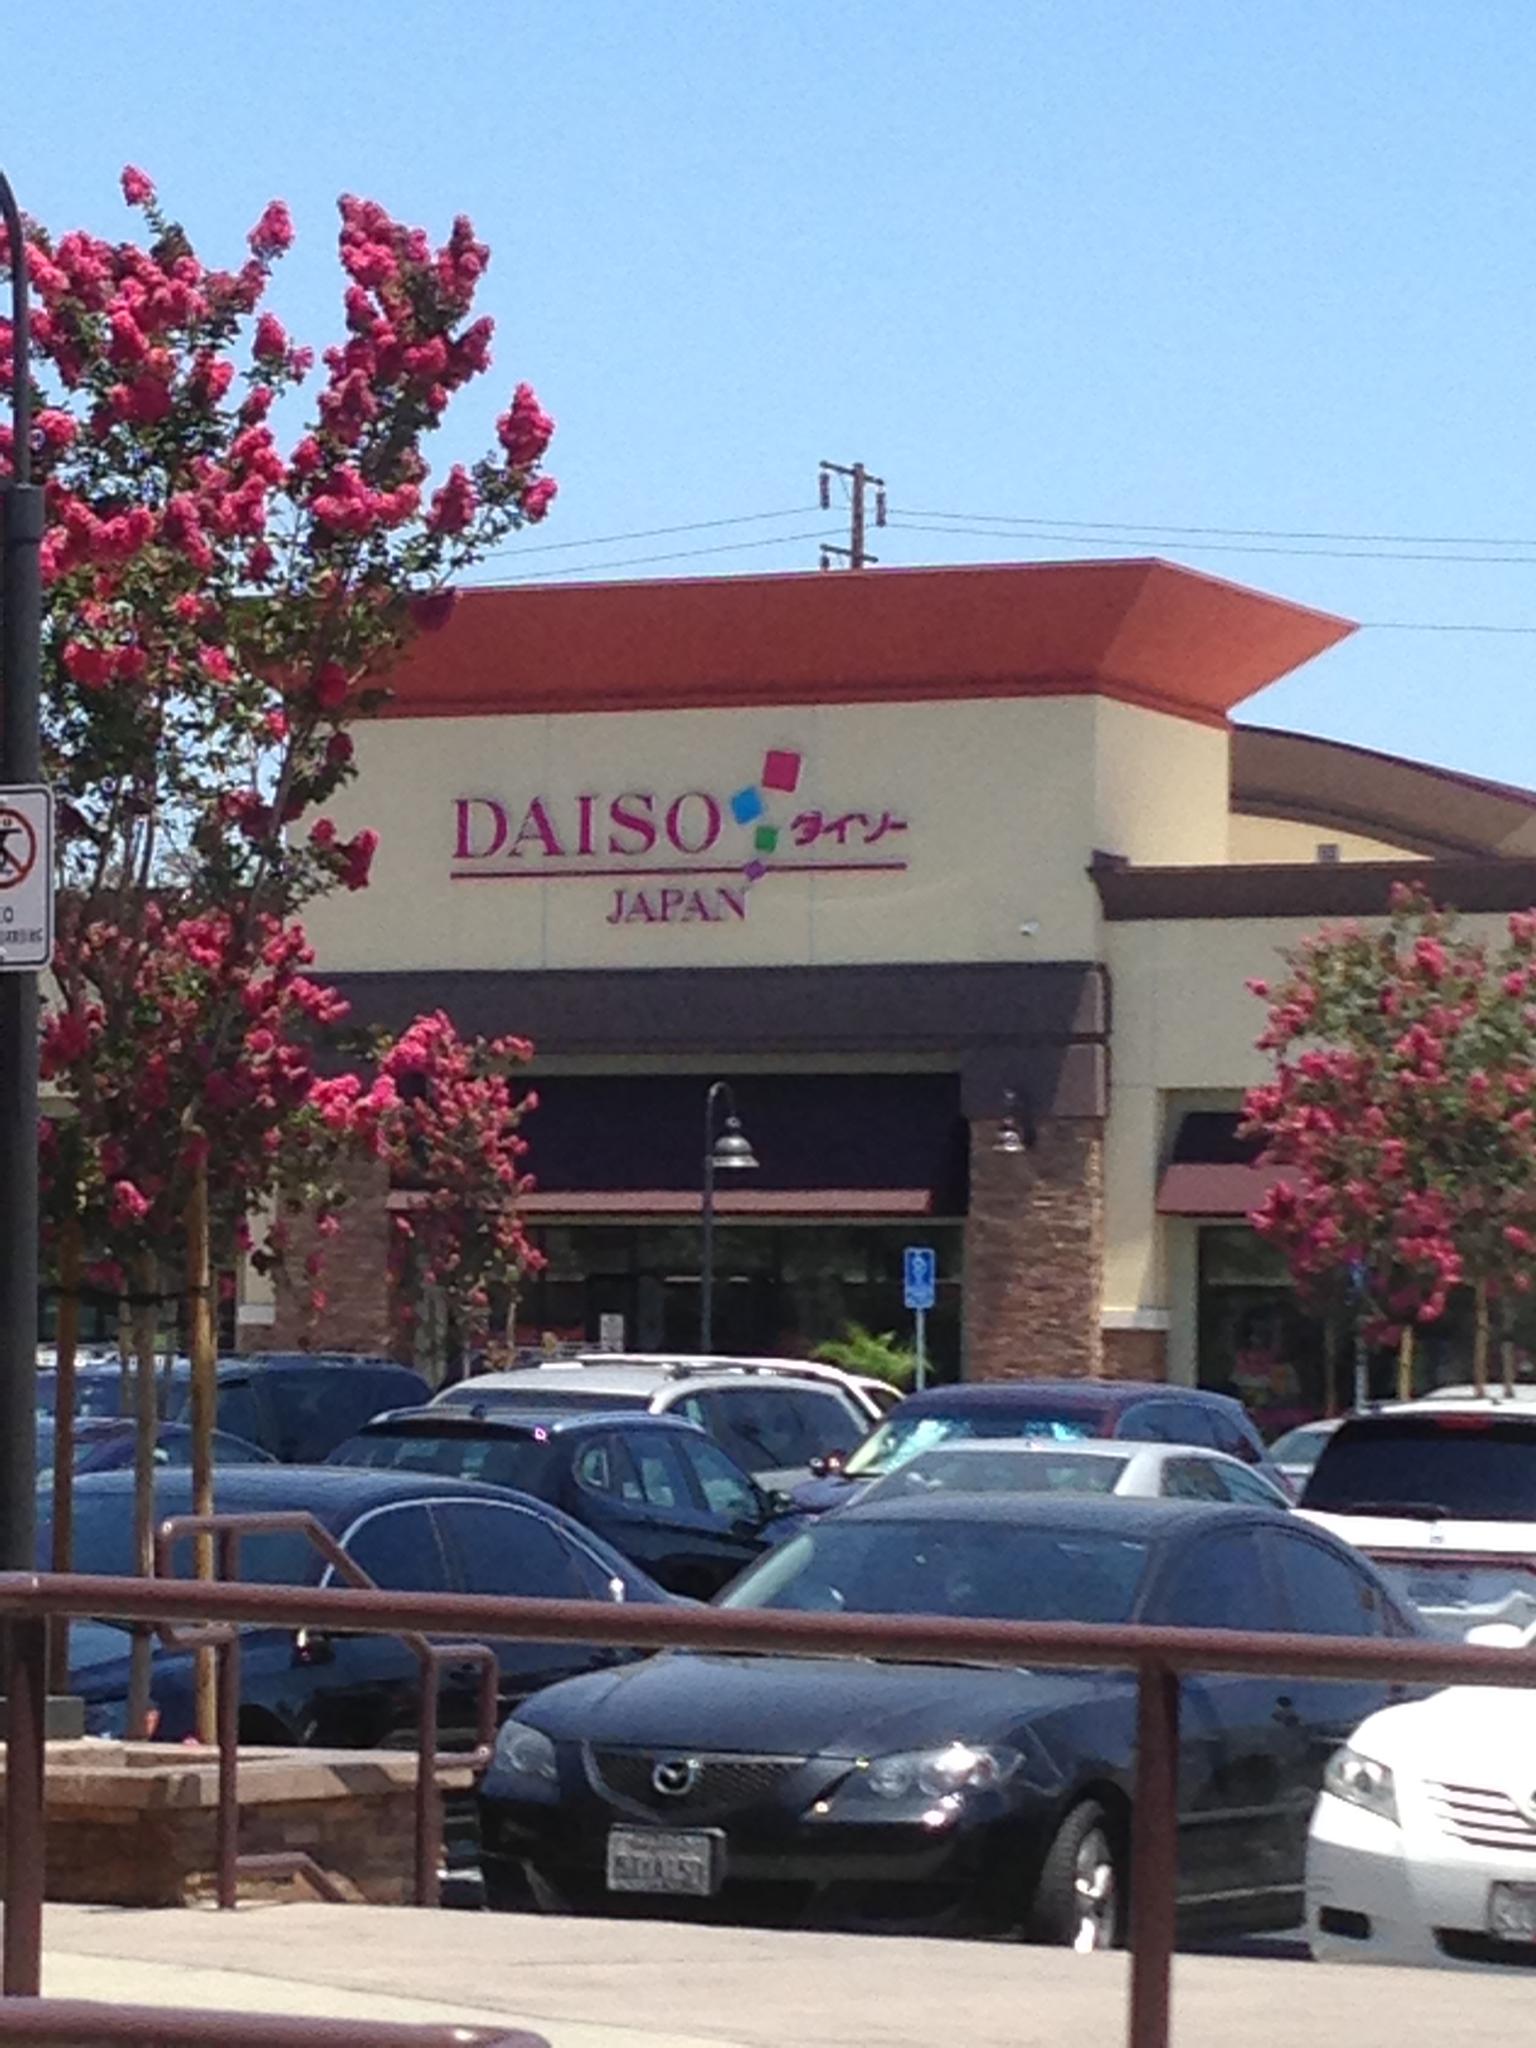 Daiso Japan 5131 Beach Blvd Ste A Buena Park Ca 90621